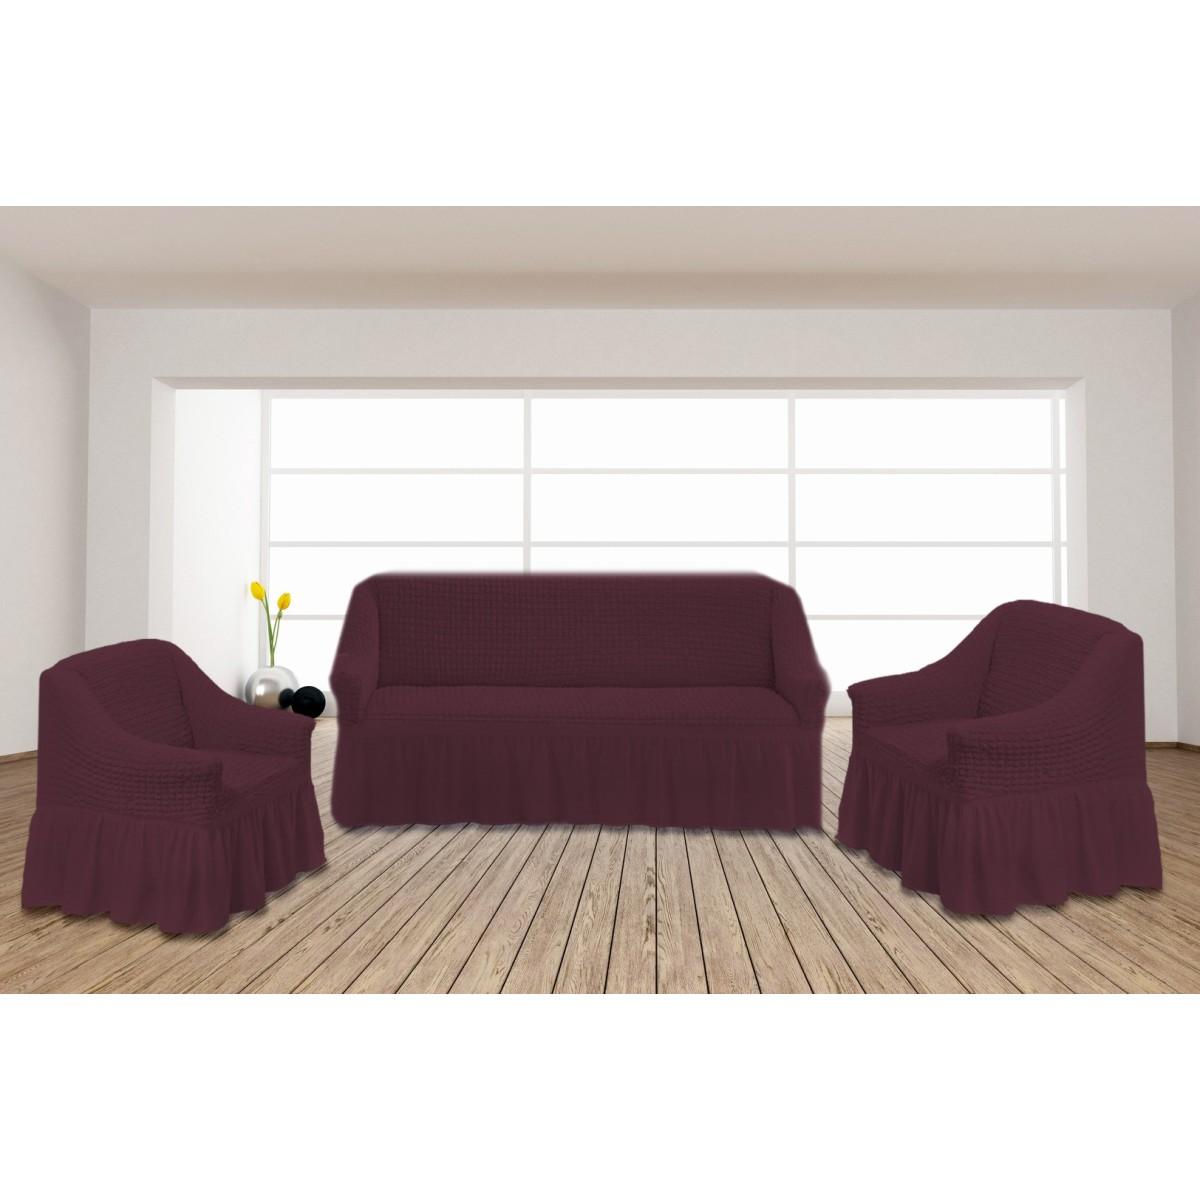 Комплект чехлов для мебели Texrepublic Absolute 8824